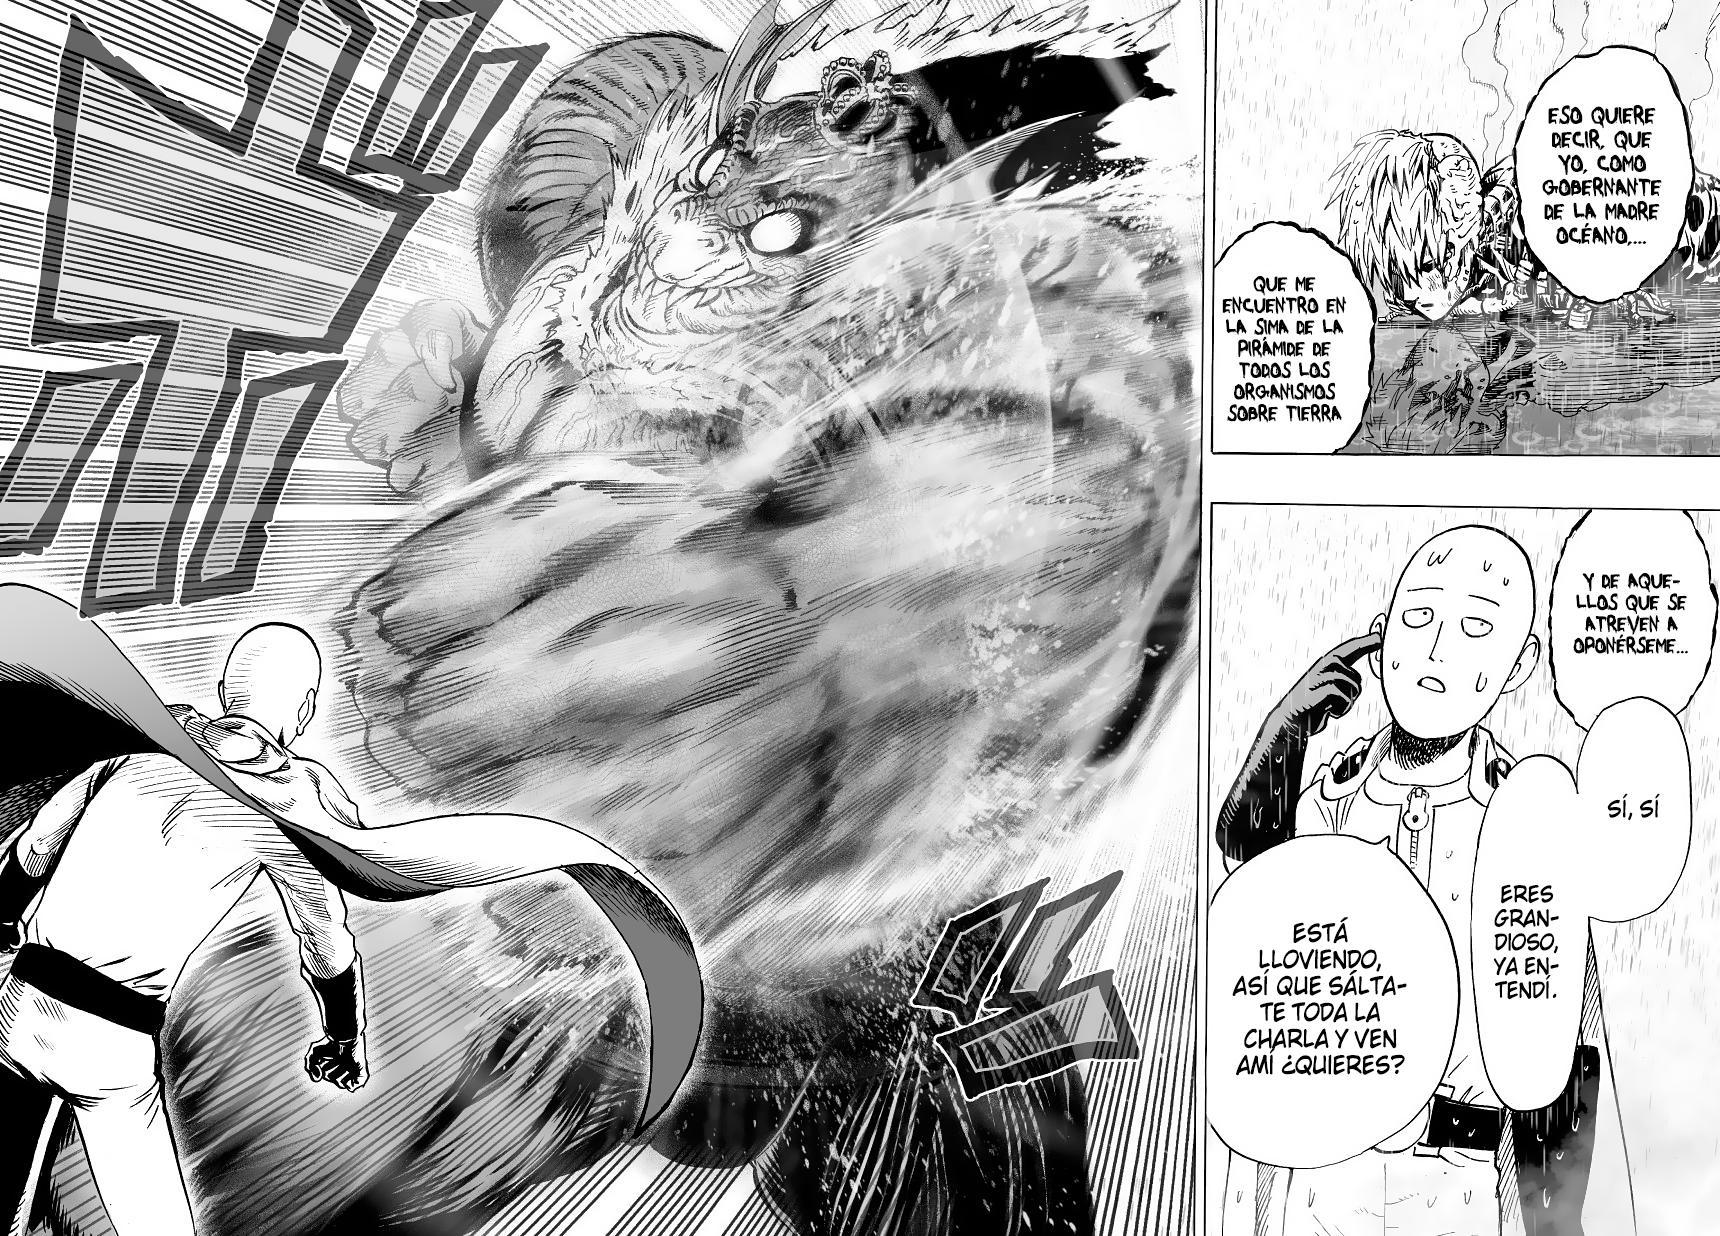 http://c5.ninemanga.com/es_manga/21/14805/362304/1c32110f1396a5bf23f1b114ce6e65d6.jpg Page 6